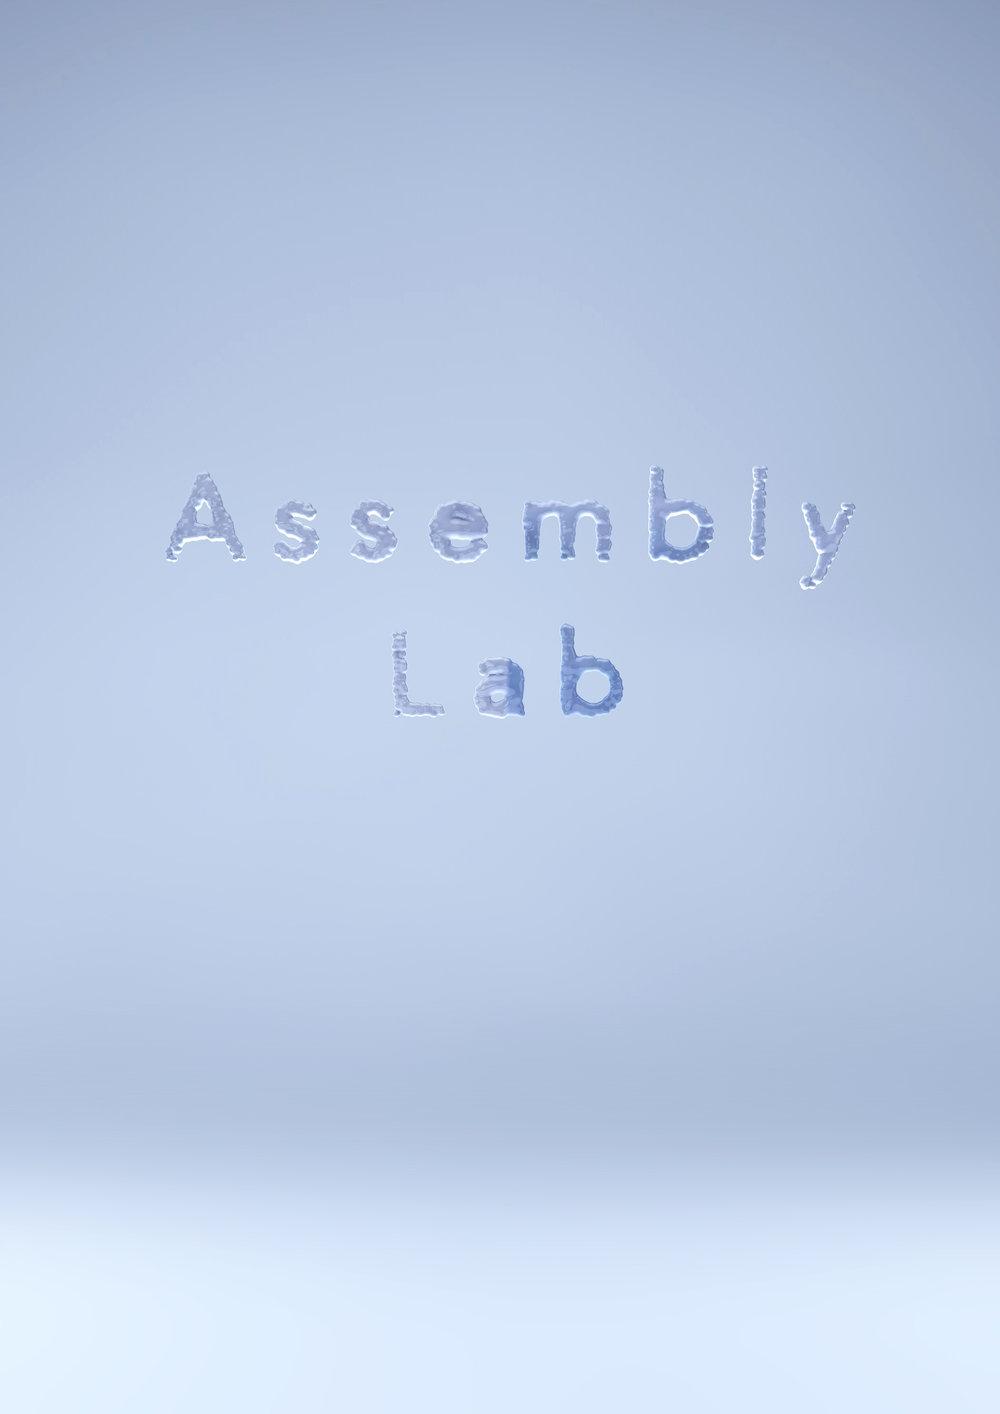 assemblylab_LOGO_portrait.jpg